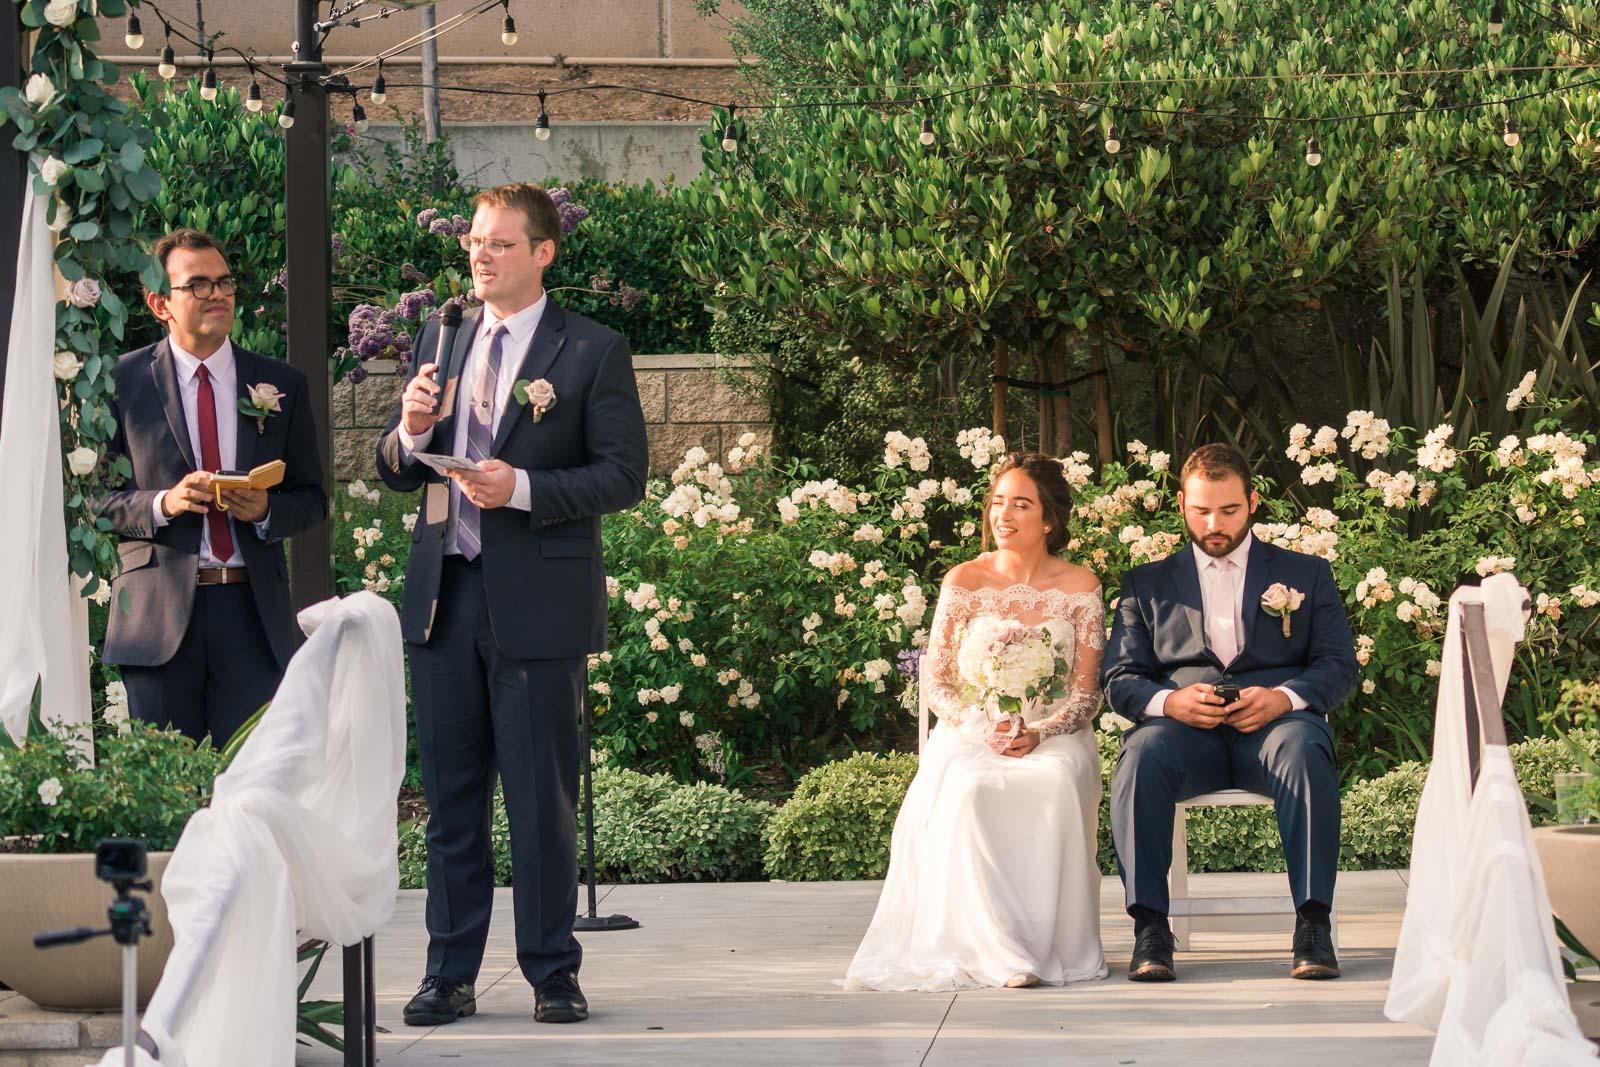 191_Angel-Brea-Orange-County_Joseph-Barber-Wedding-Photography.jpg